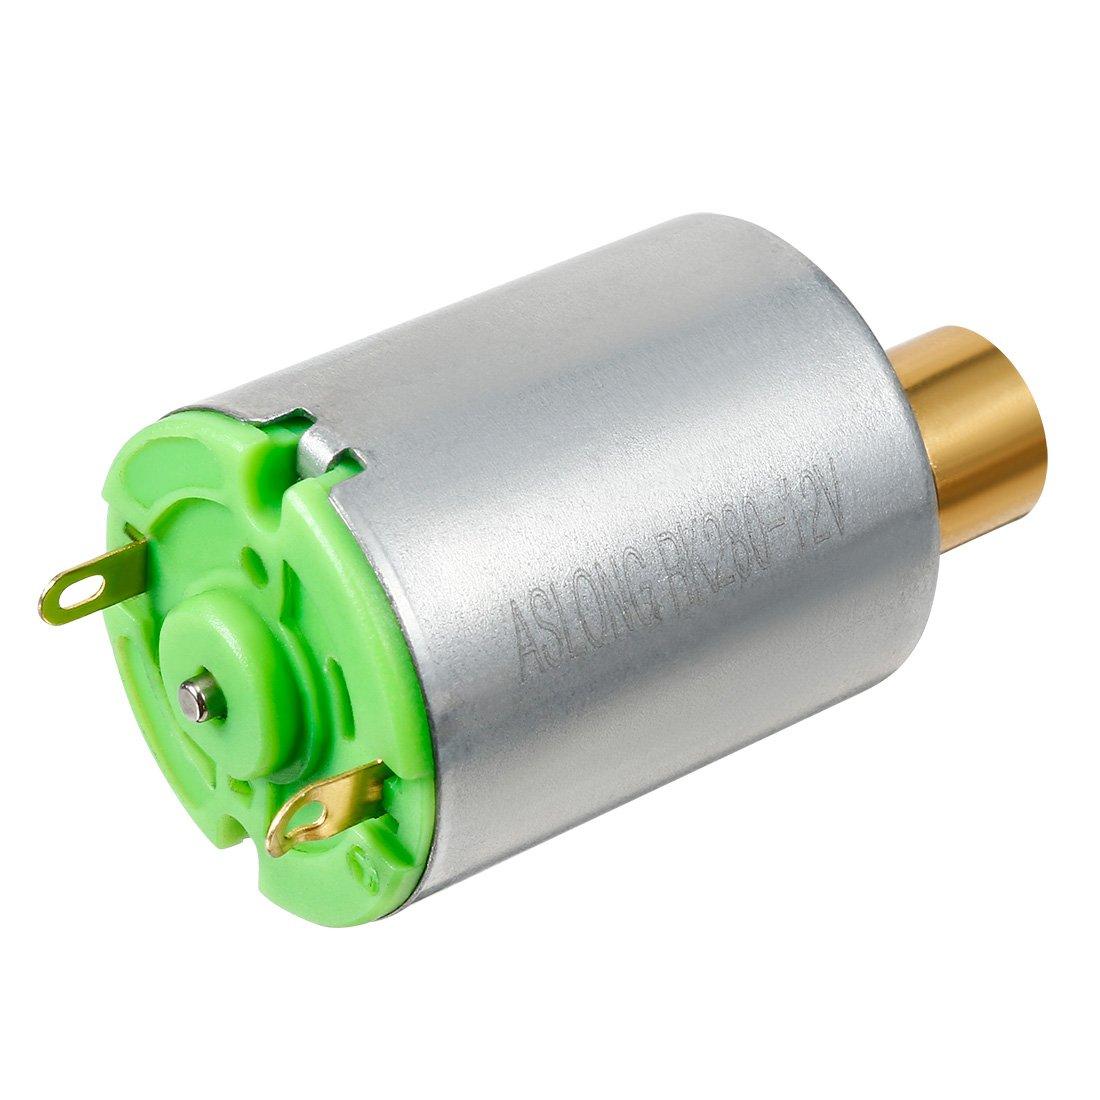 uxcell a11101800ux0165 DC 3V 1100RPM 0.2A High Speed Mini Vibration Motor for DIY Toys - Permanent Magnet Motors - Amazon.com